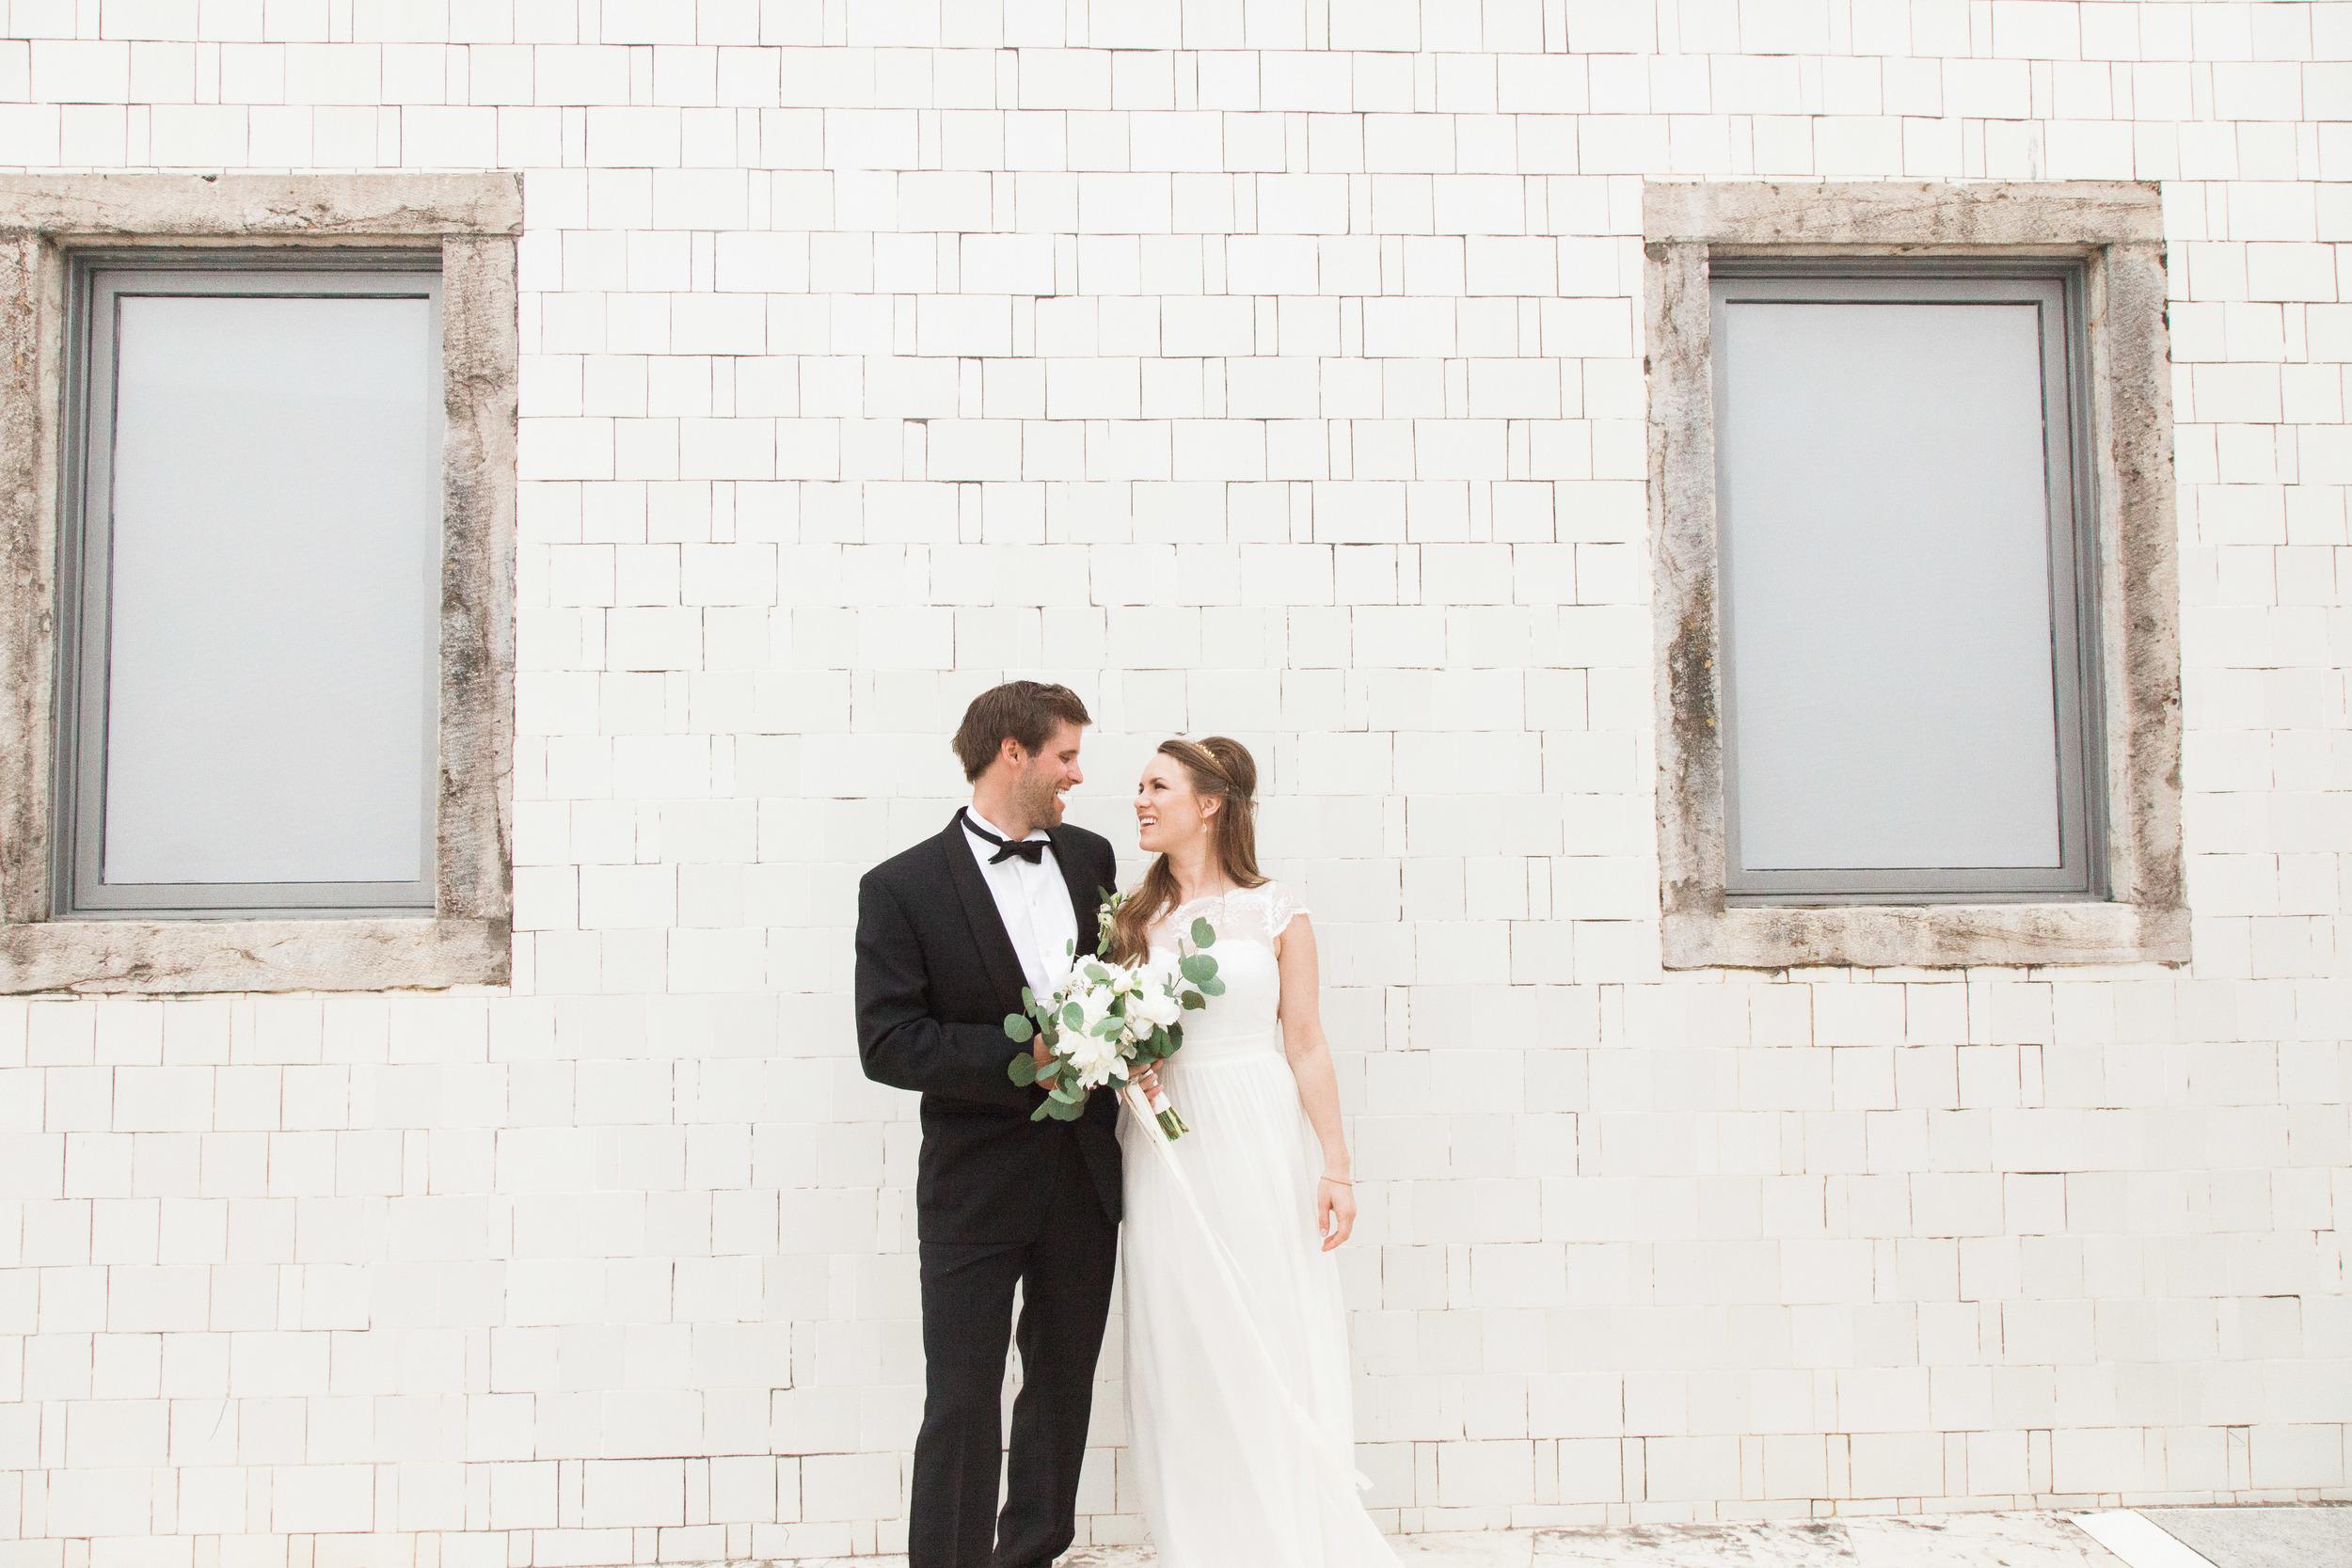 mariarao+wedding+portugal+cascais-398.jpg